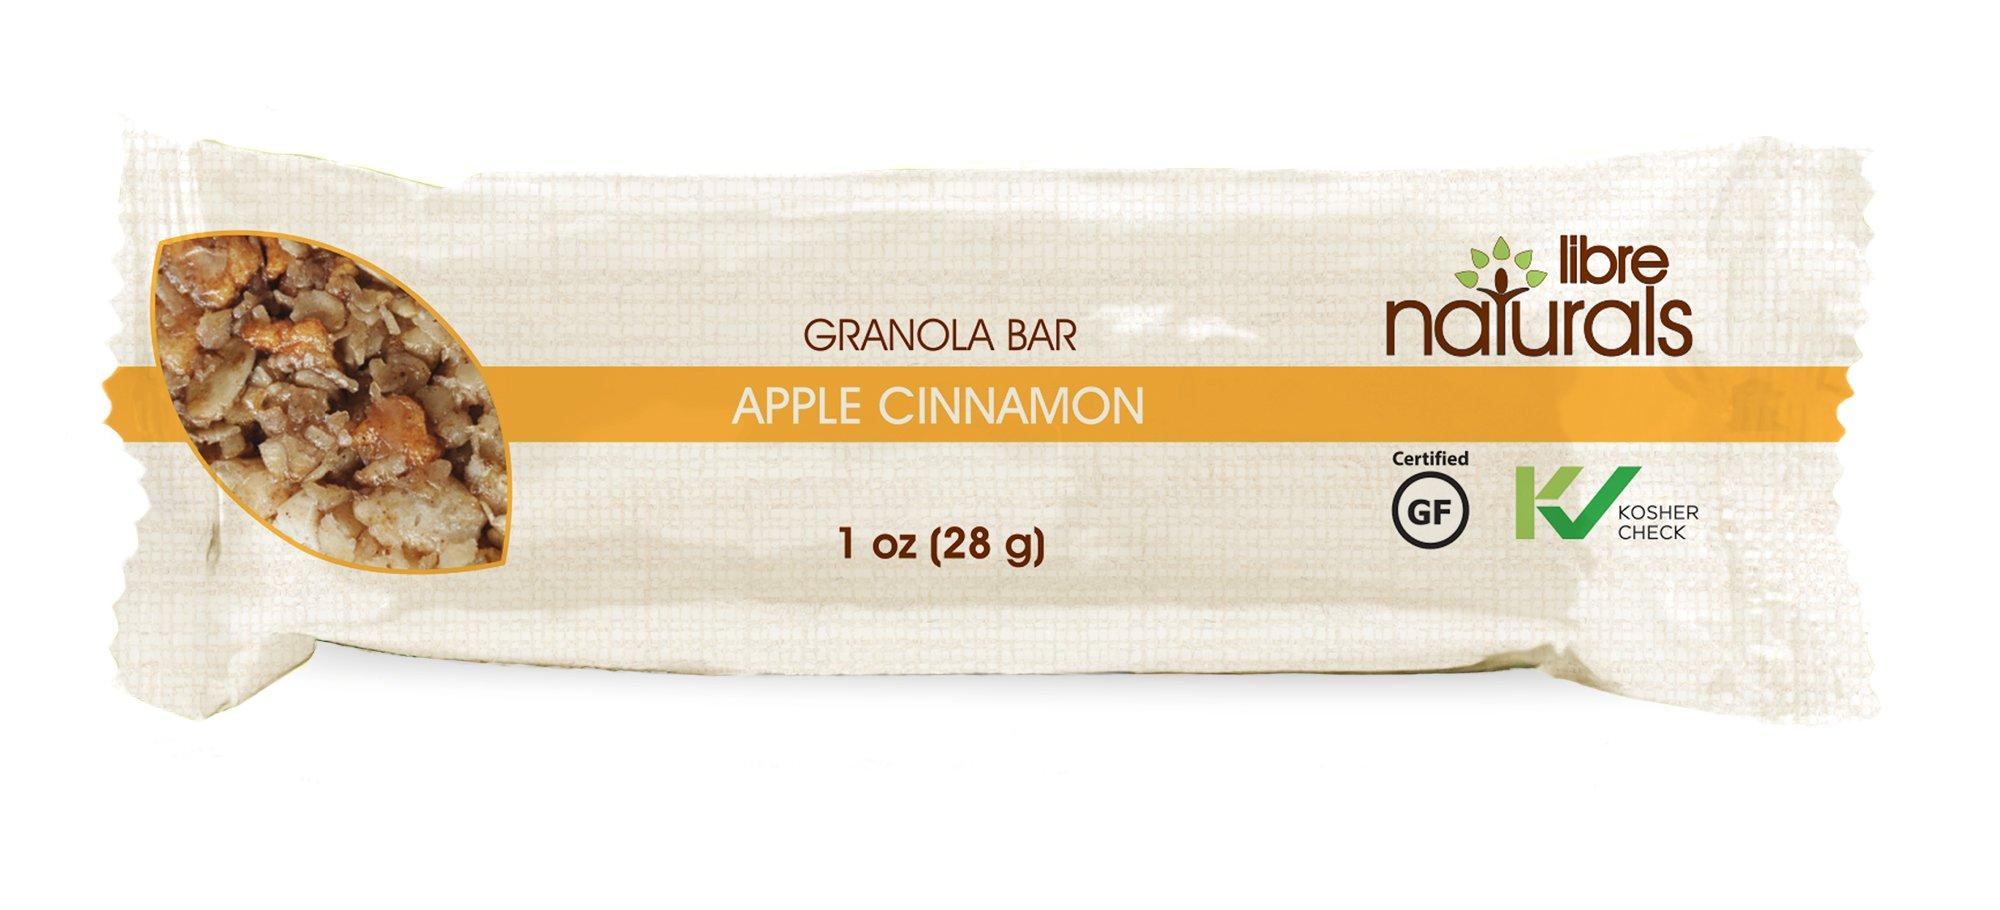 Nut Free, Gluten Free >> Apple Cinnamon Vegan Granola Bar - Libre Naturals, 28 gram, 100 Bar Bulk Case